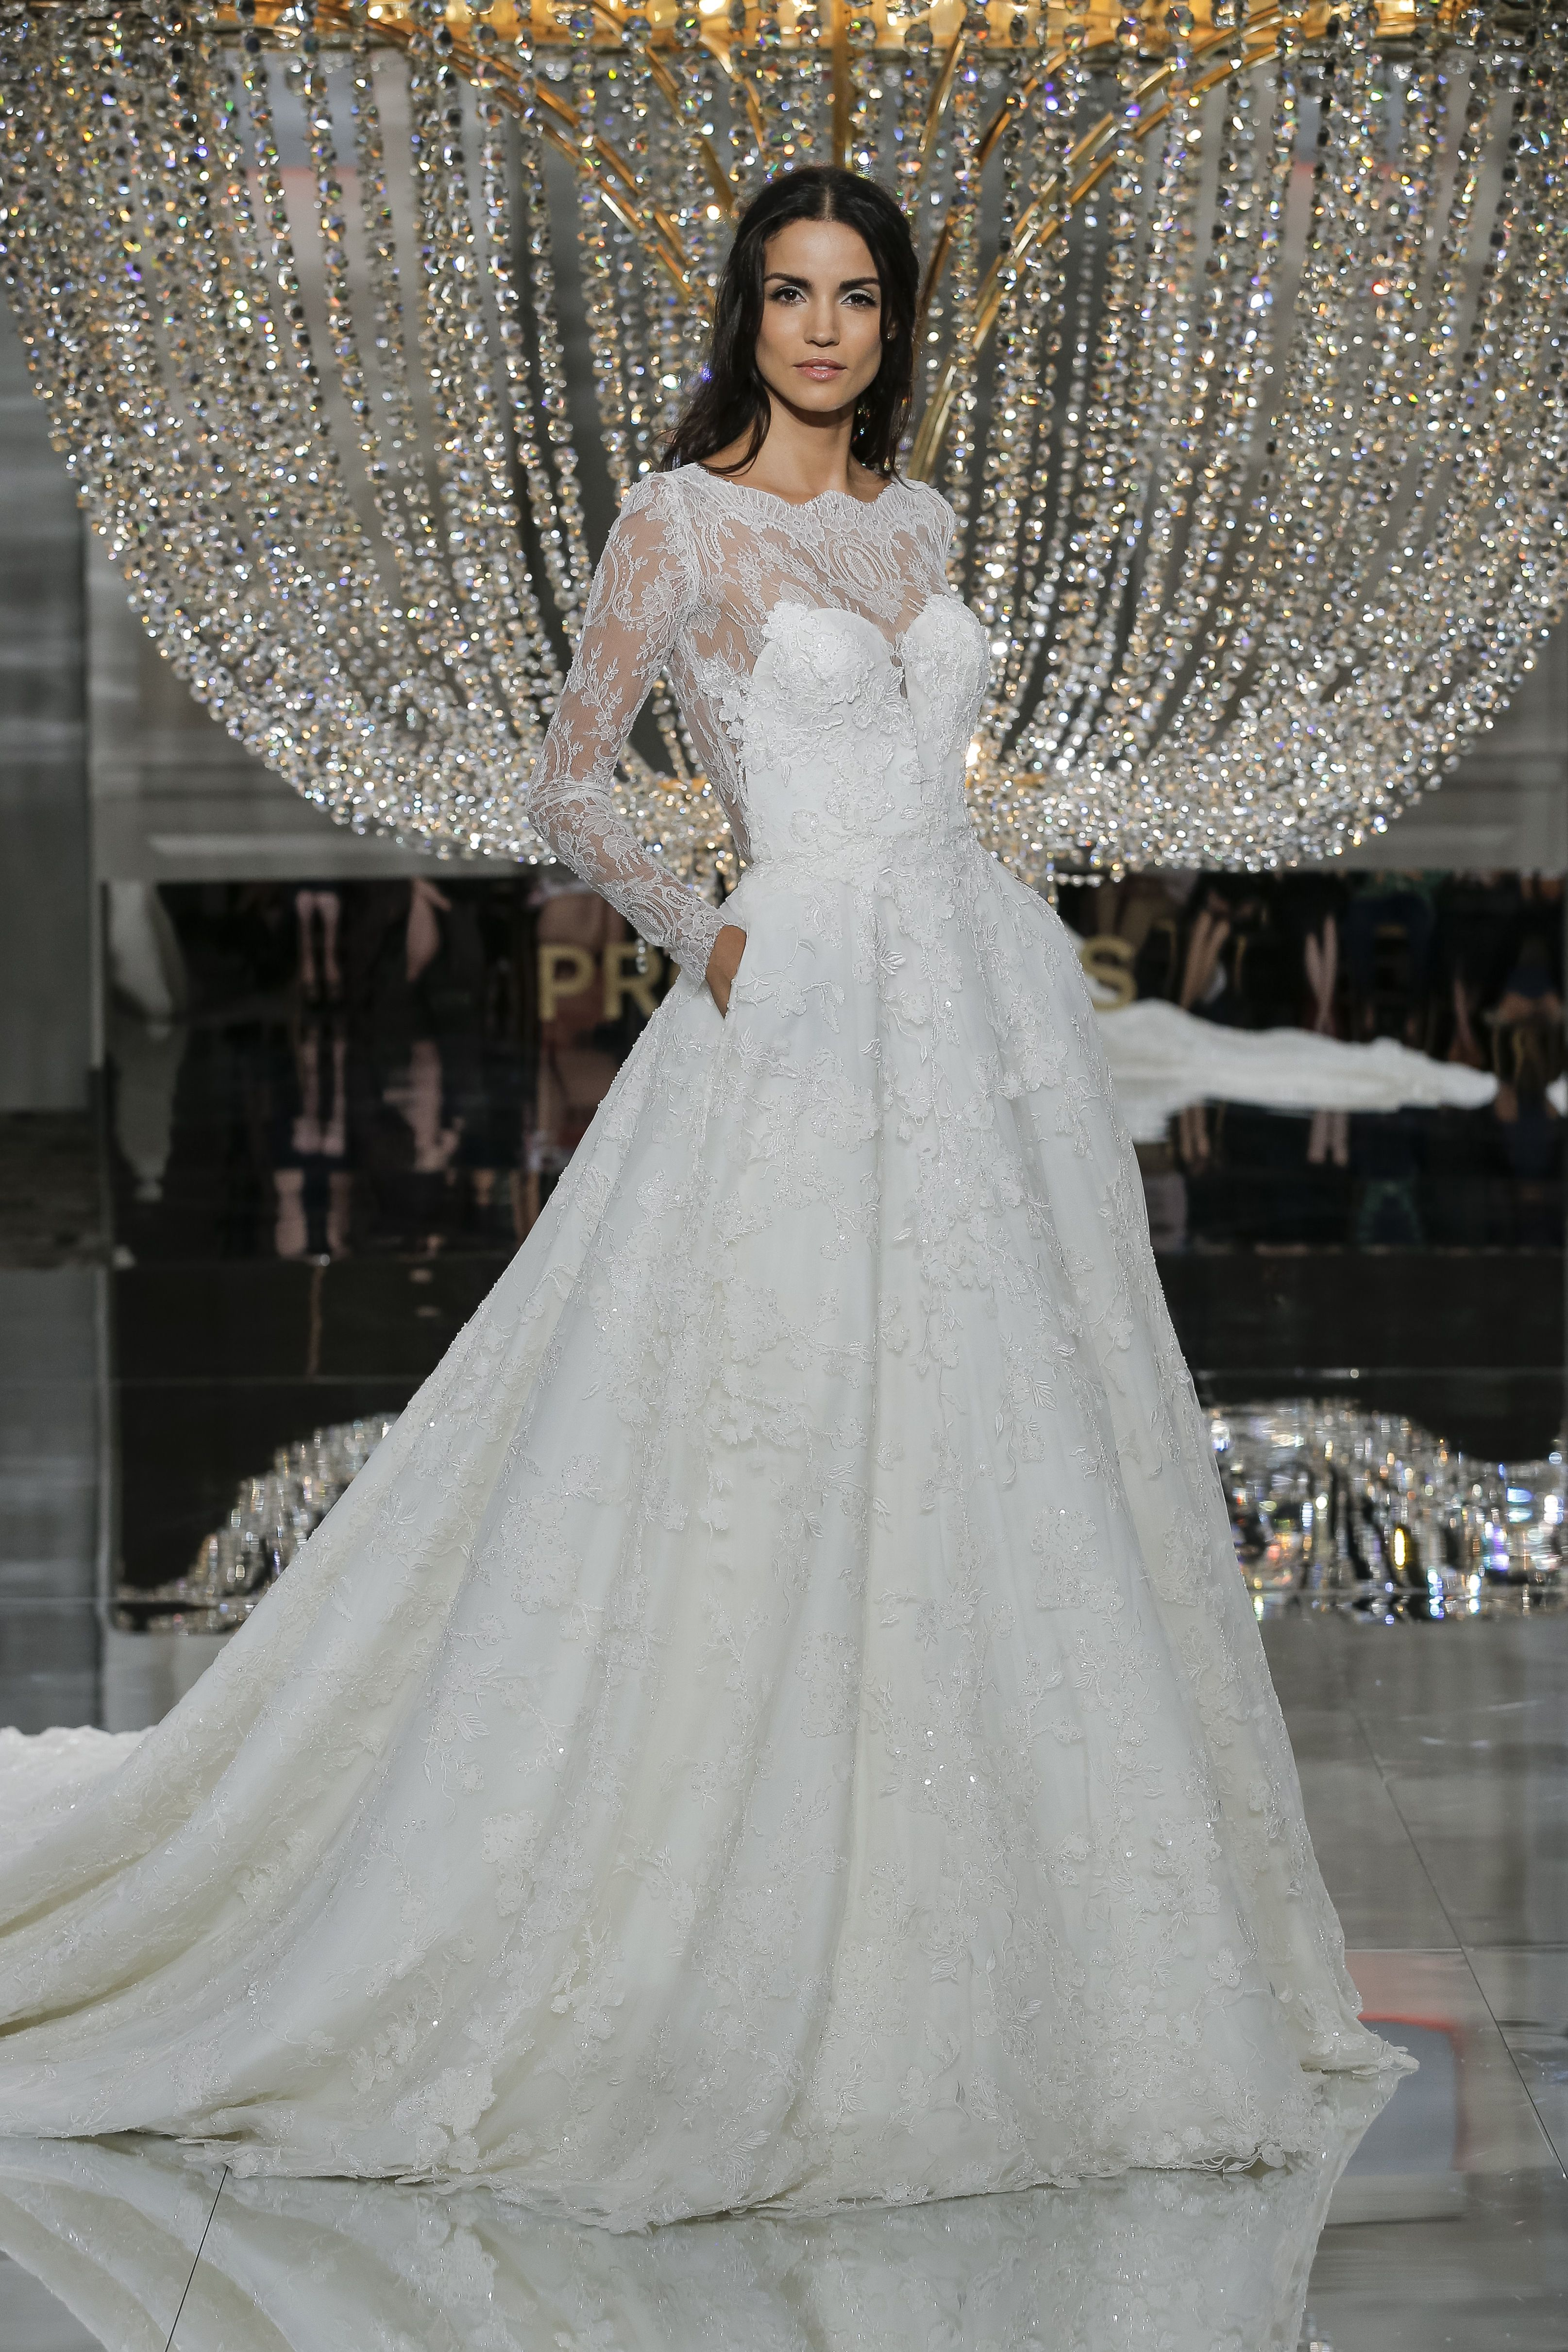 RUTH dress from ATELIER PRONOVIAS | wedding | Pinterest